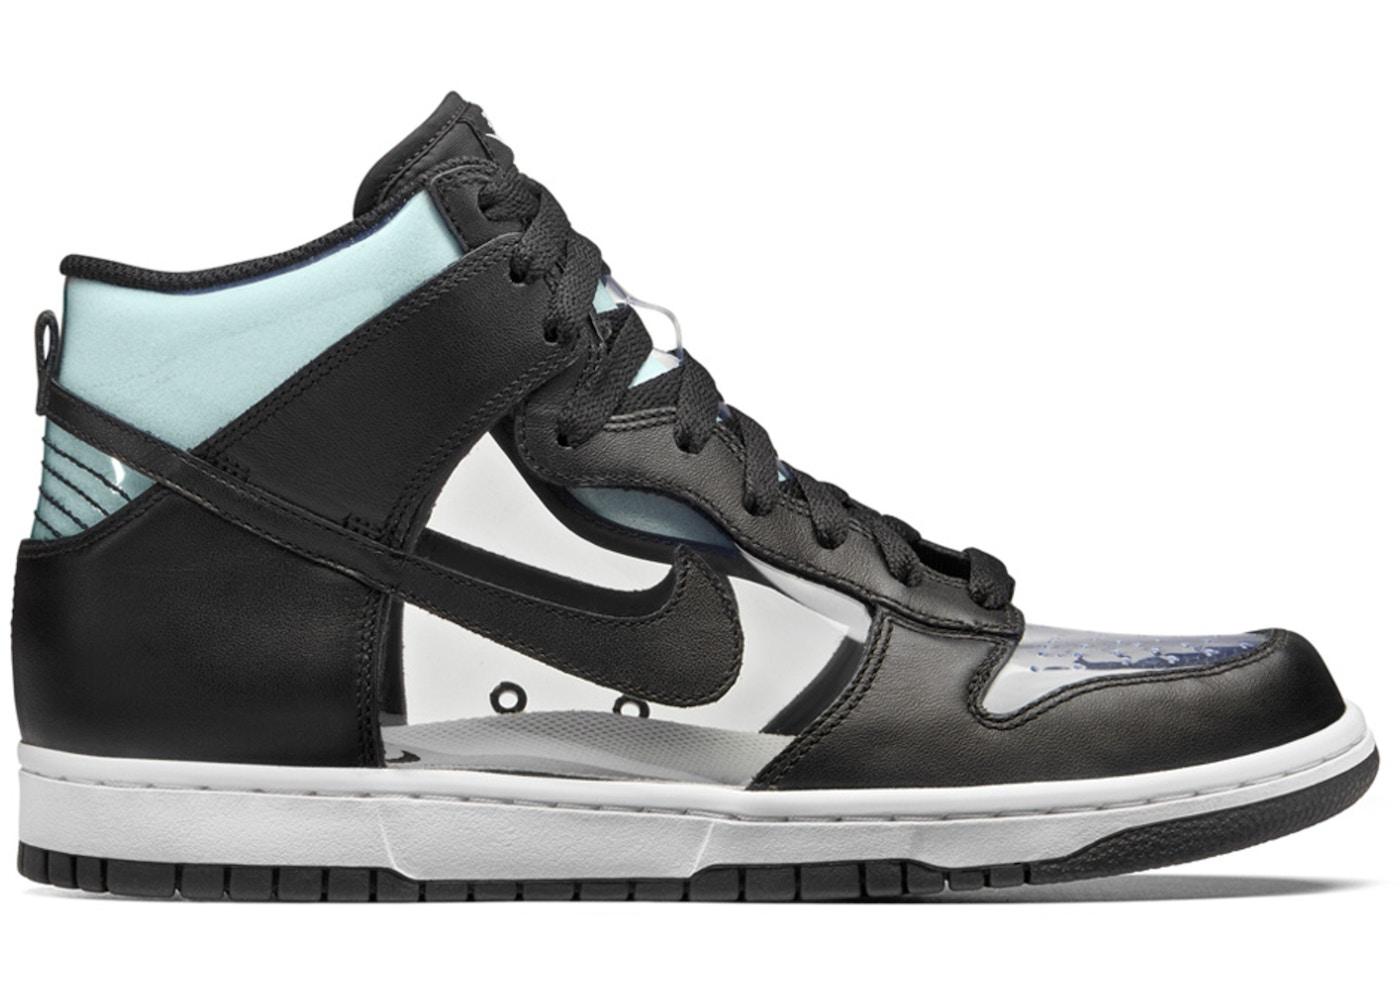 half off 1c549 2a0c3 Nike Dunk High Comme Des Garcons Clear